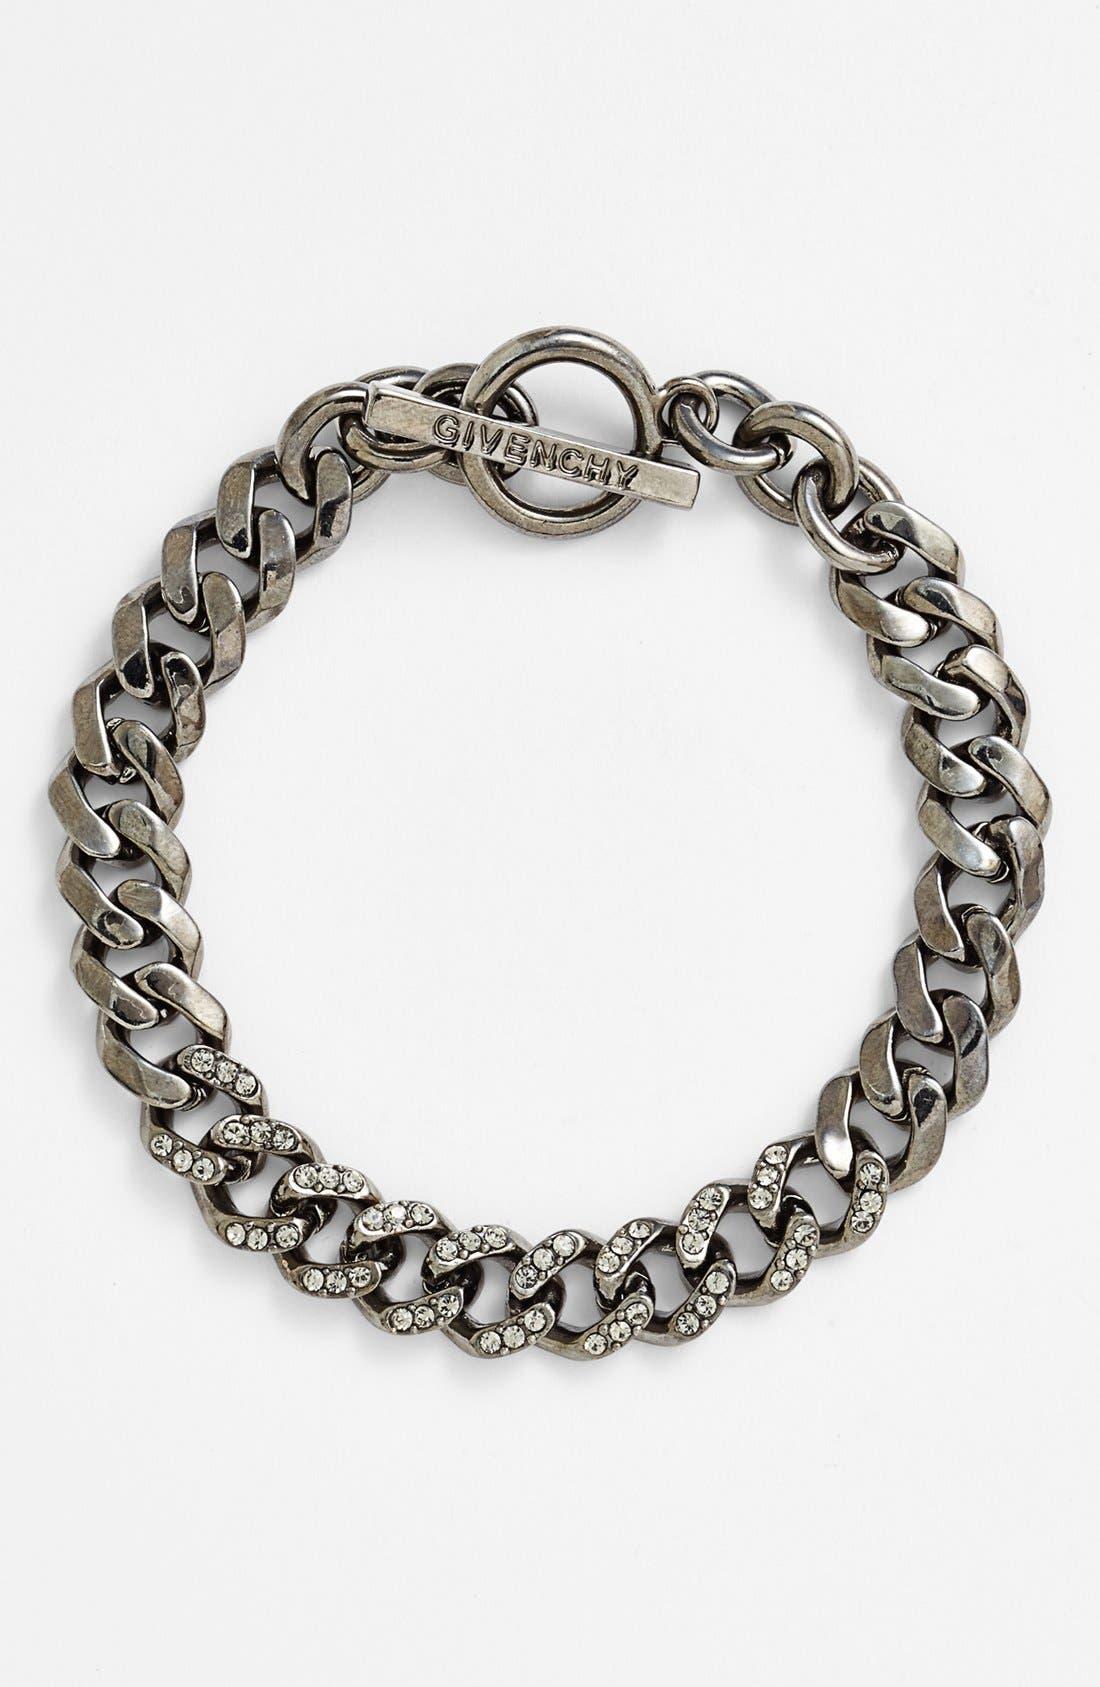 Alternate Image 1 Selected - Givenchy Pavé Chain Link Toggle Bracelet